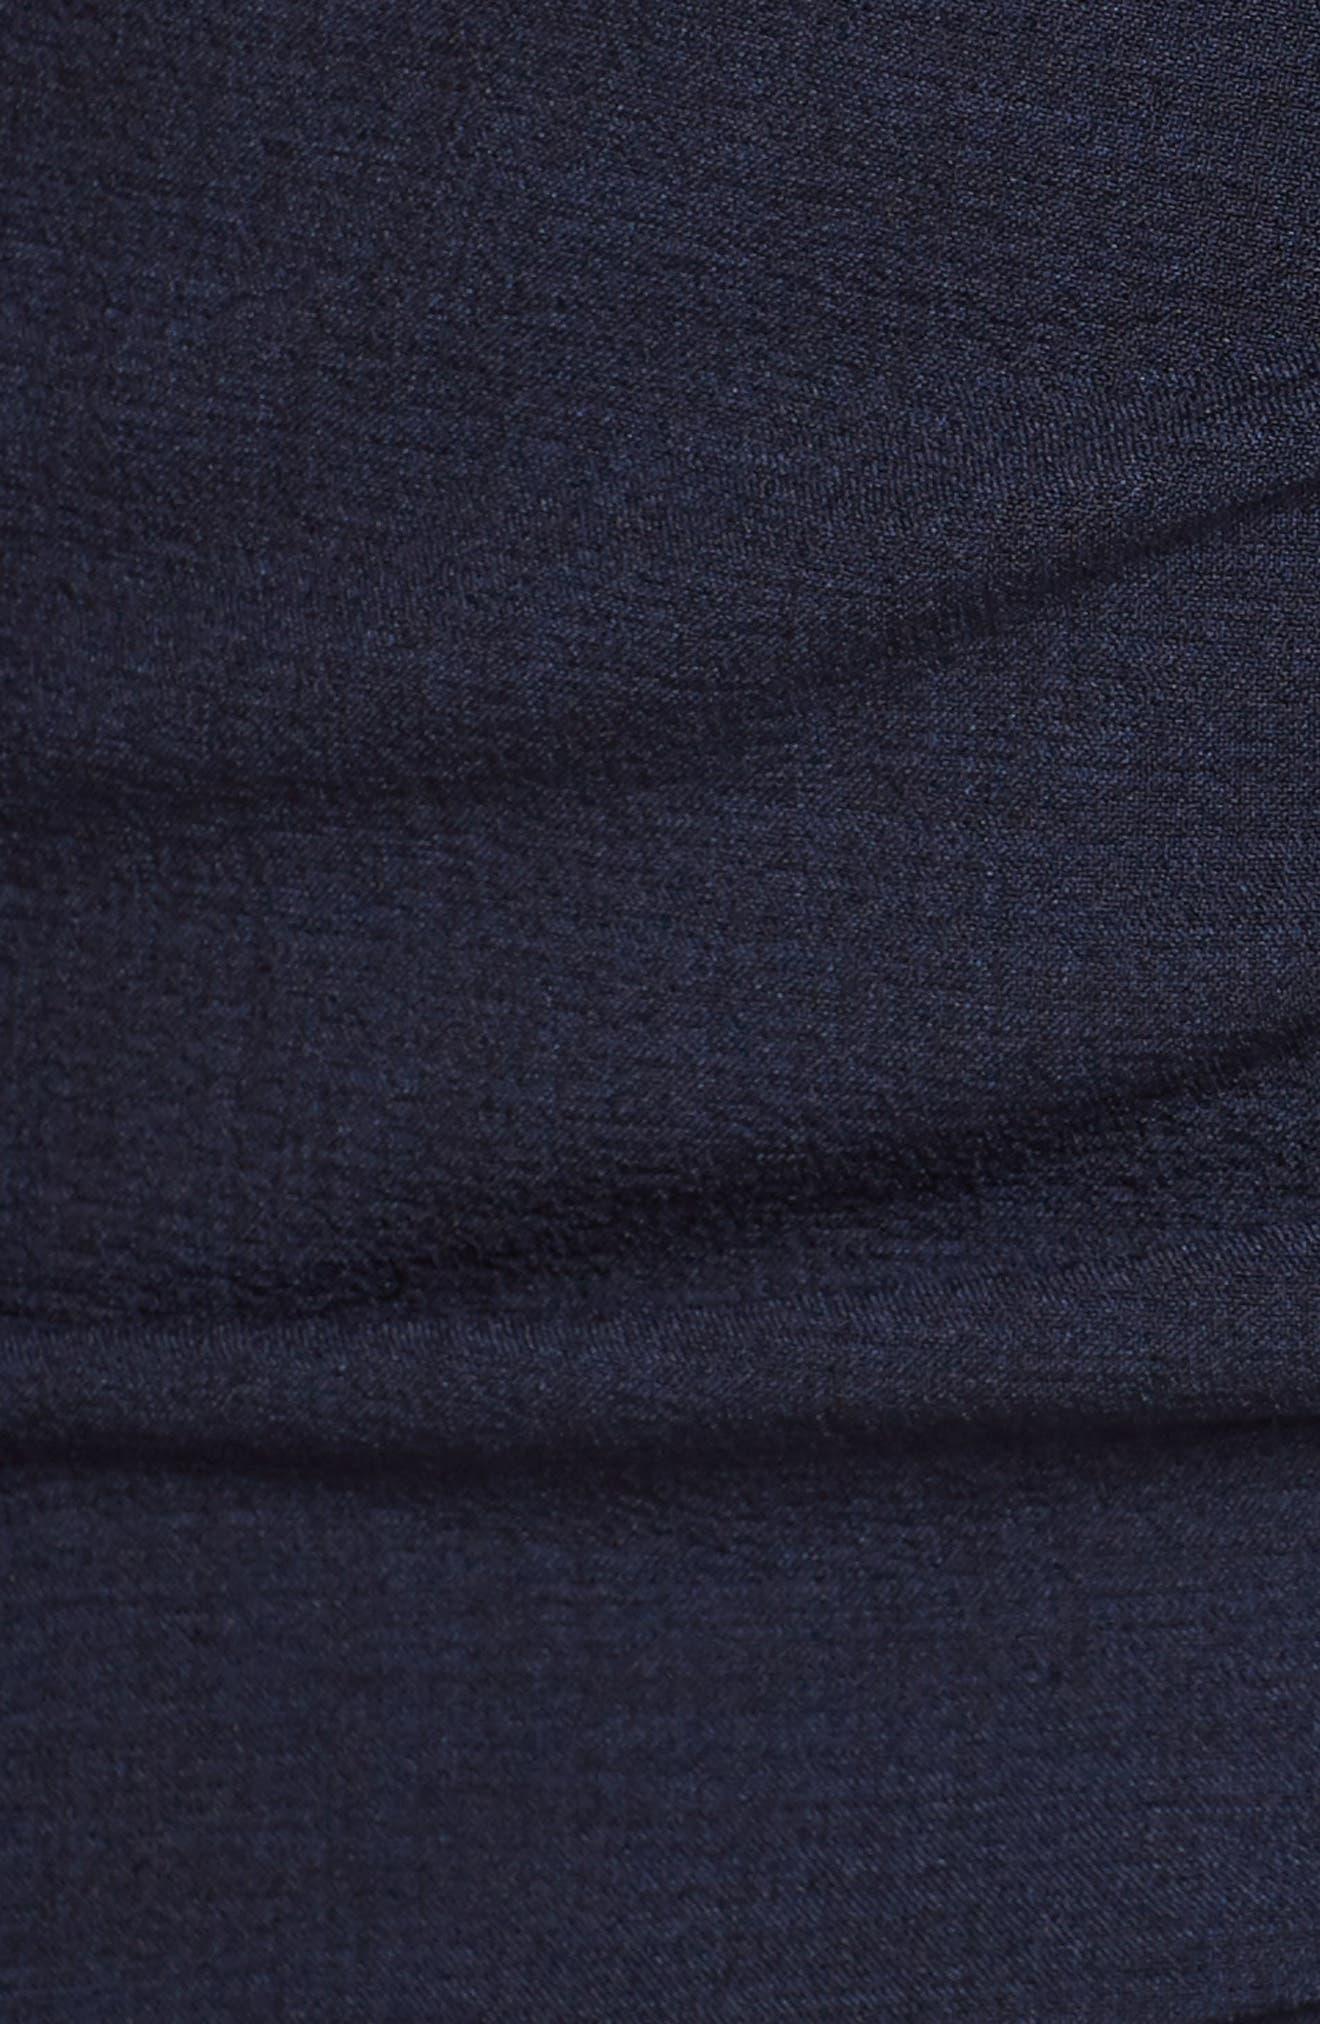 CHELSEA28, Ruffle Front Sheath Dress, Alternate thumbnail 6, color, 410